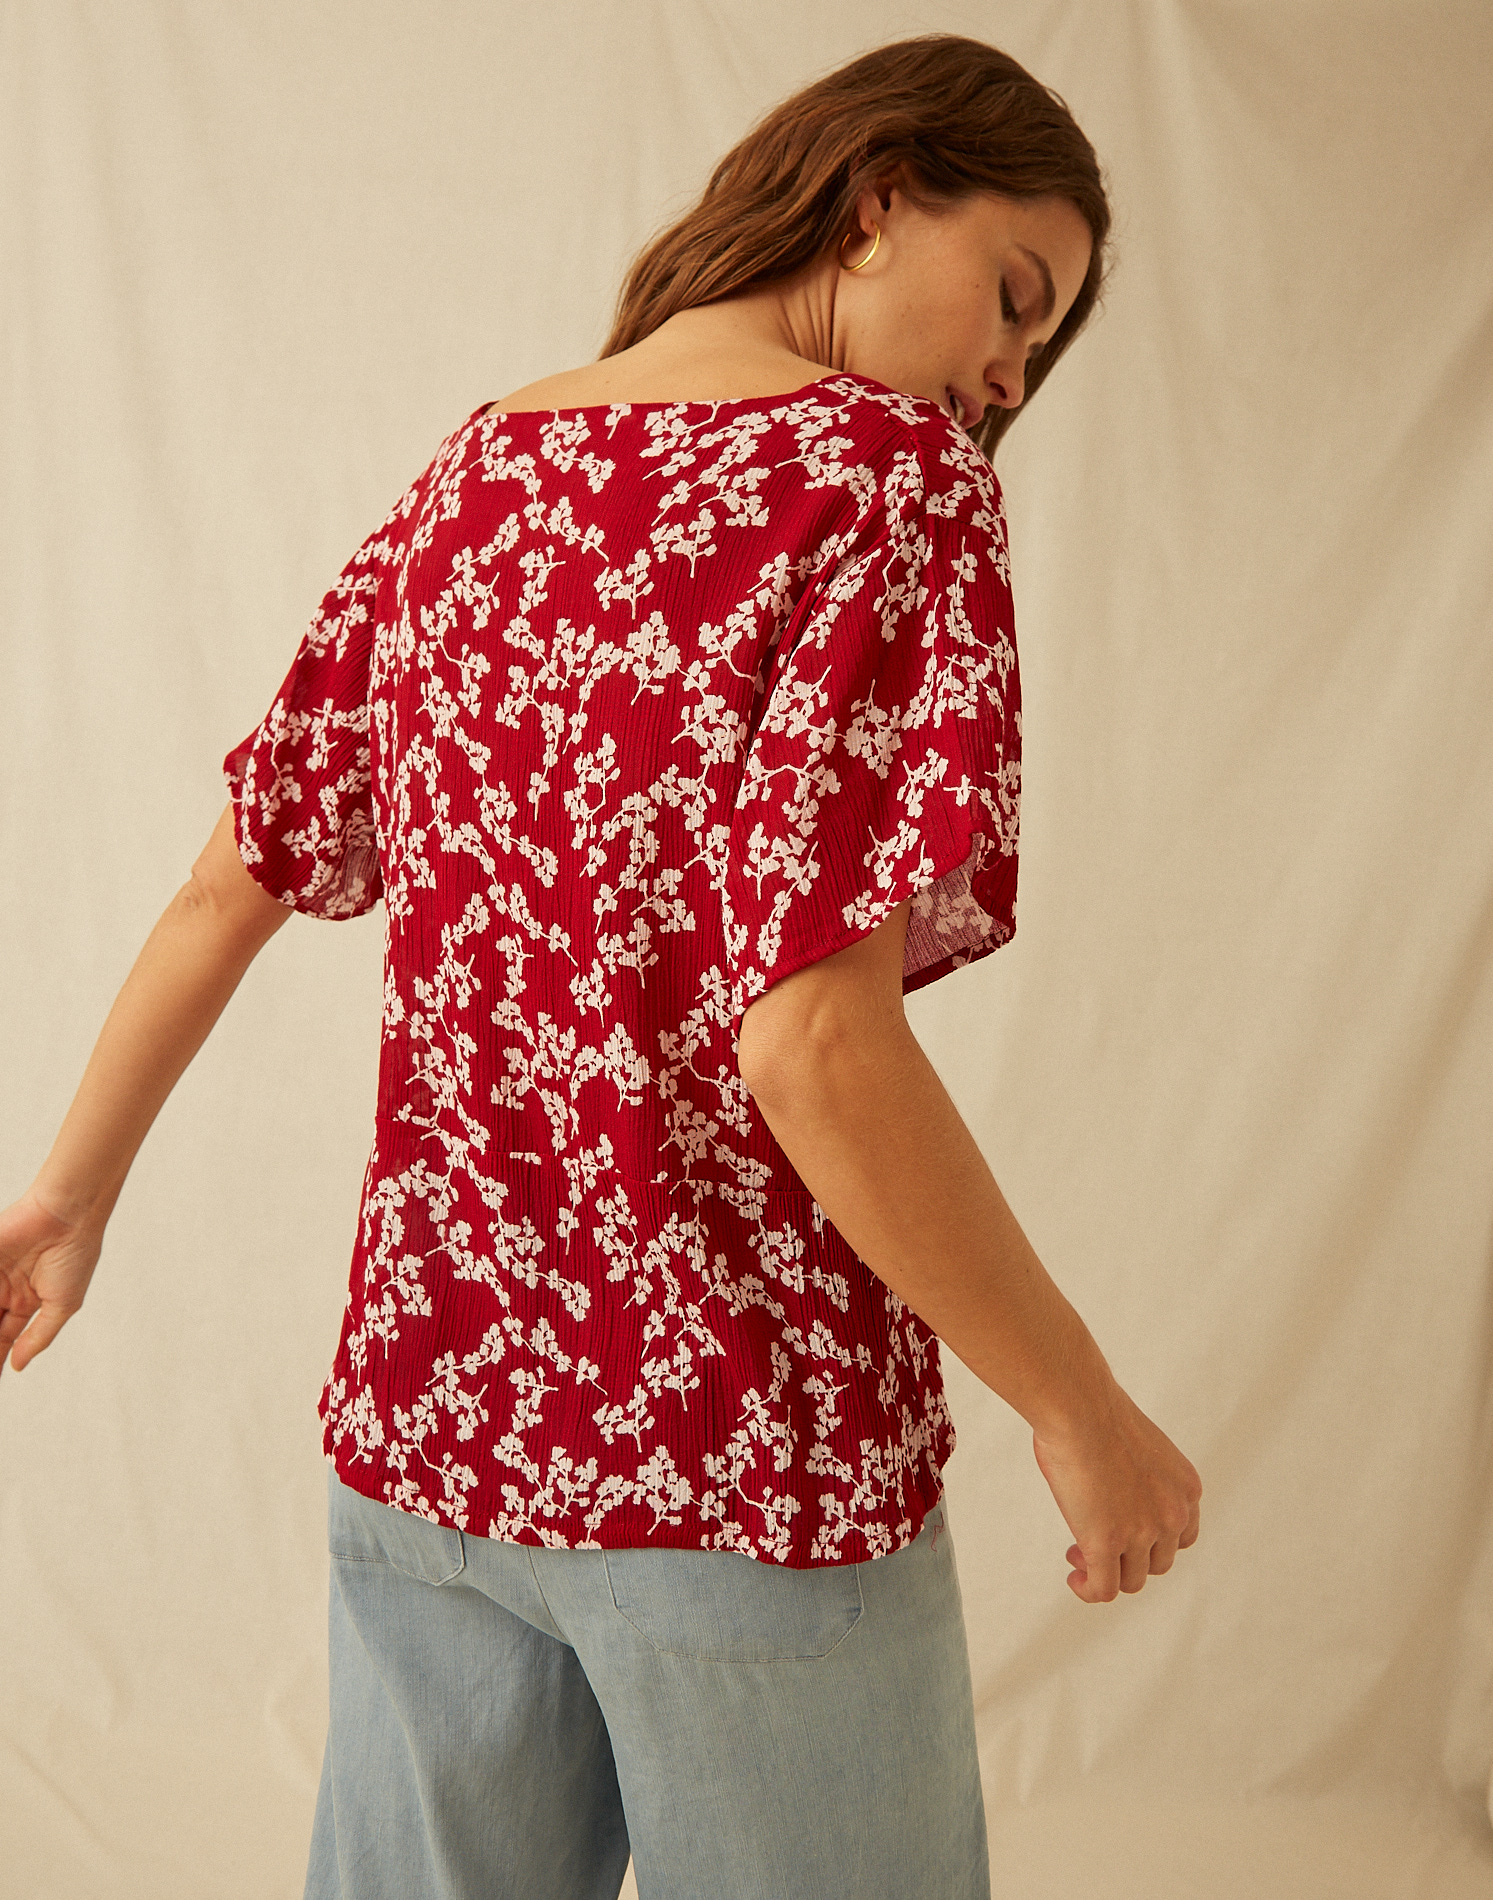 Blusa manga corta abotonada flor mini